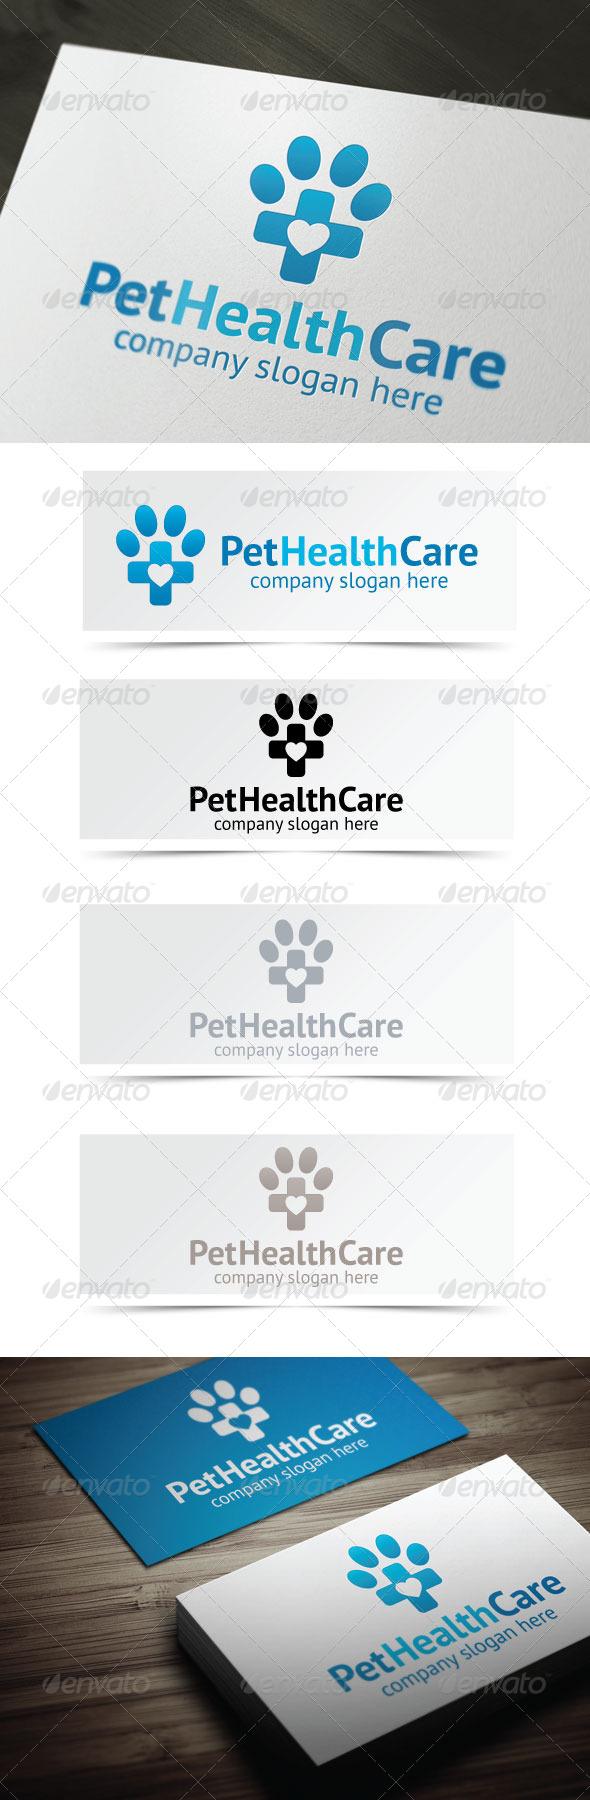 GraphicRiver Pet Health Care 4570315